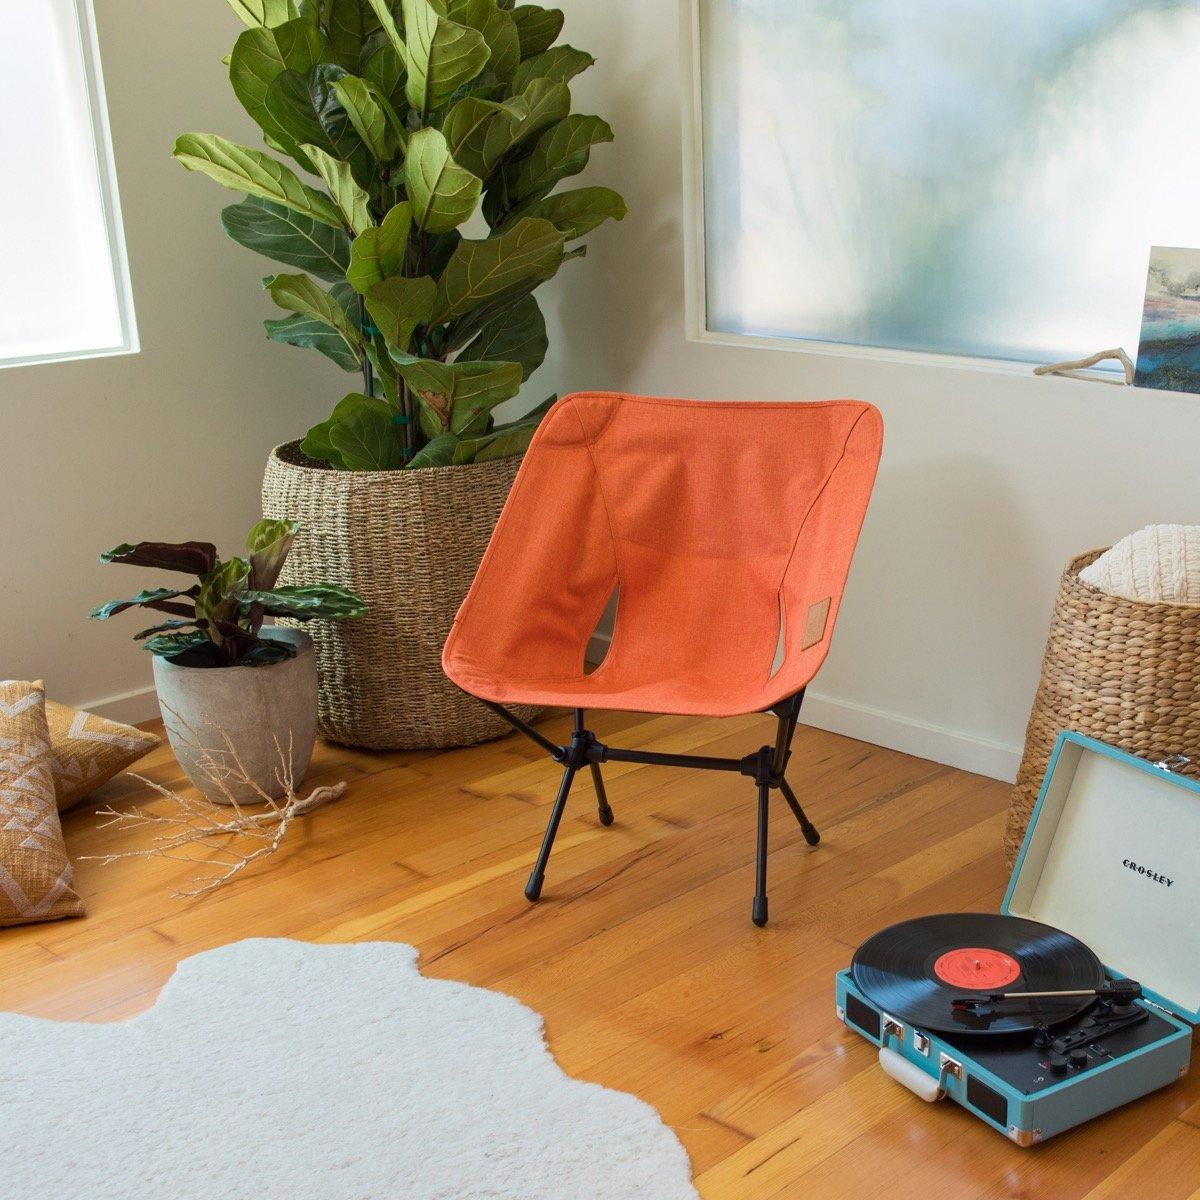 Helinox Folding Chairs